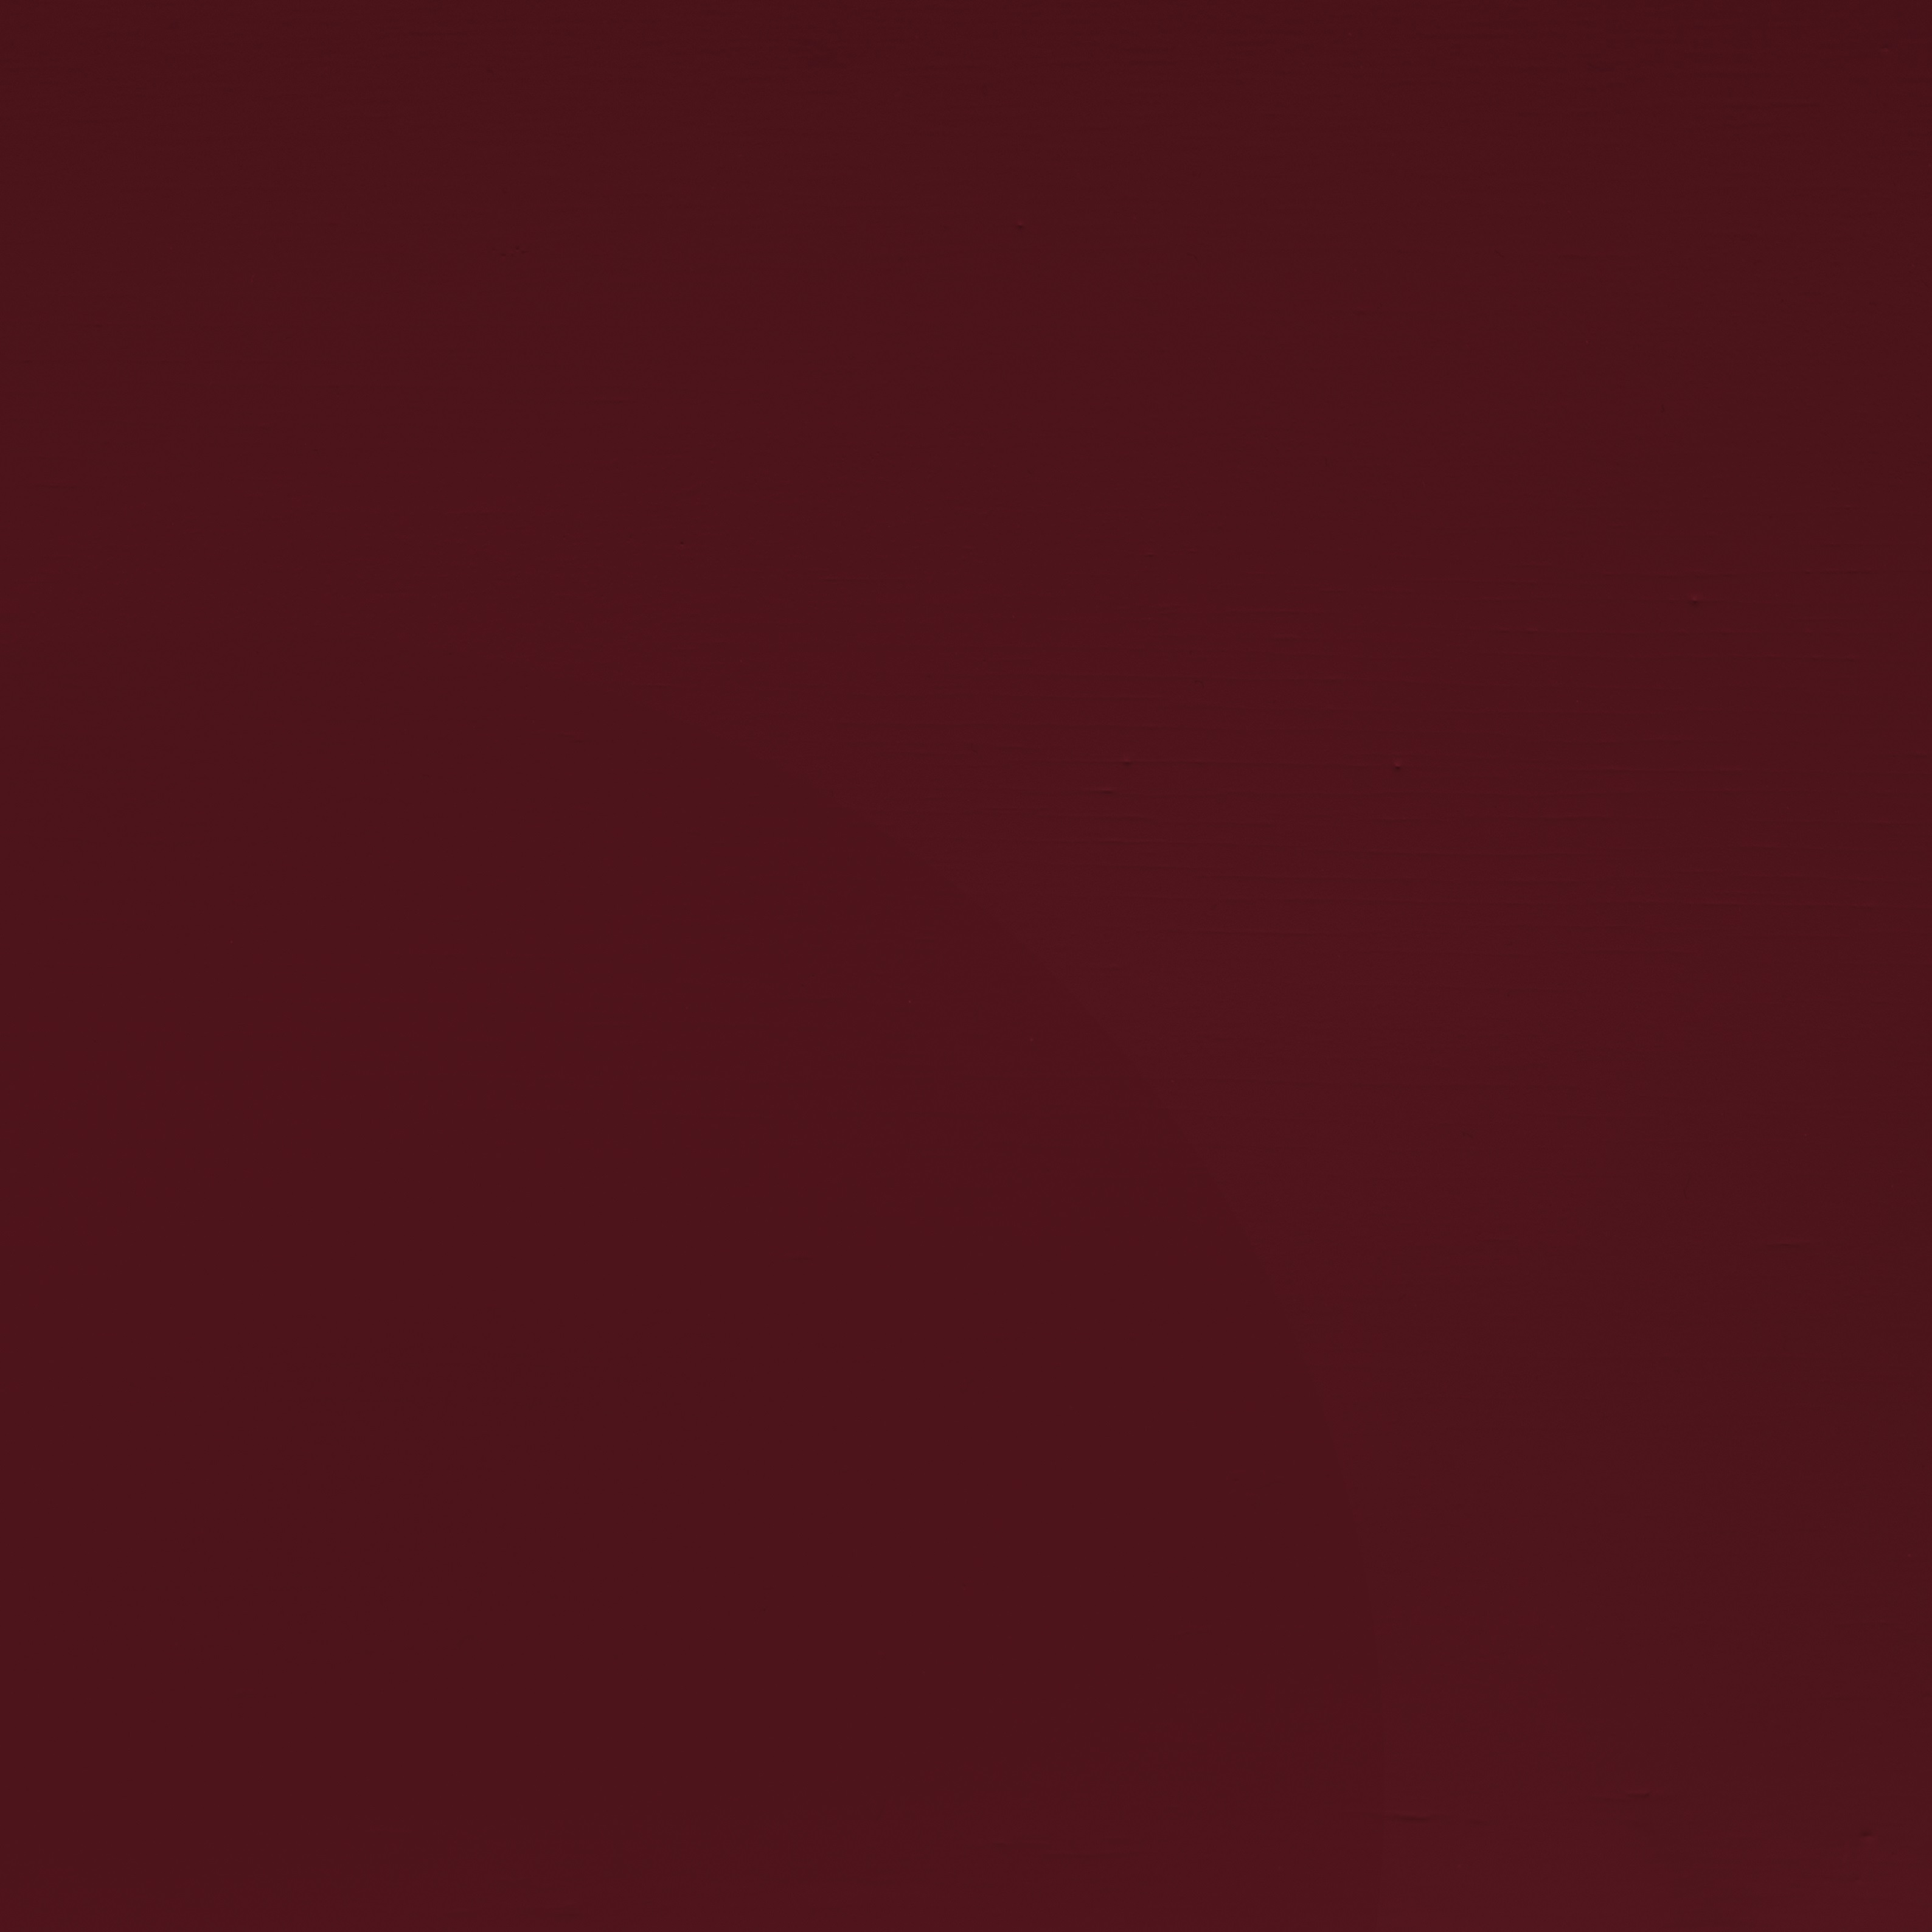 F120 burgund Mattfarbe (RAL 3005)